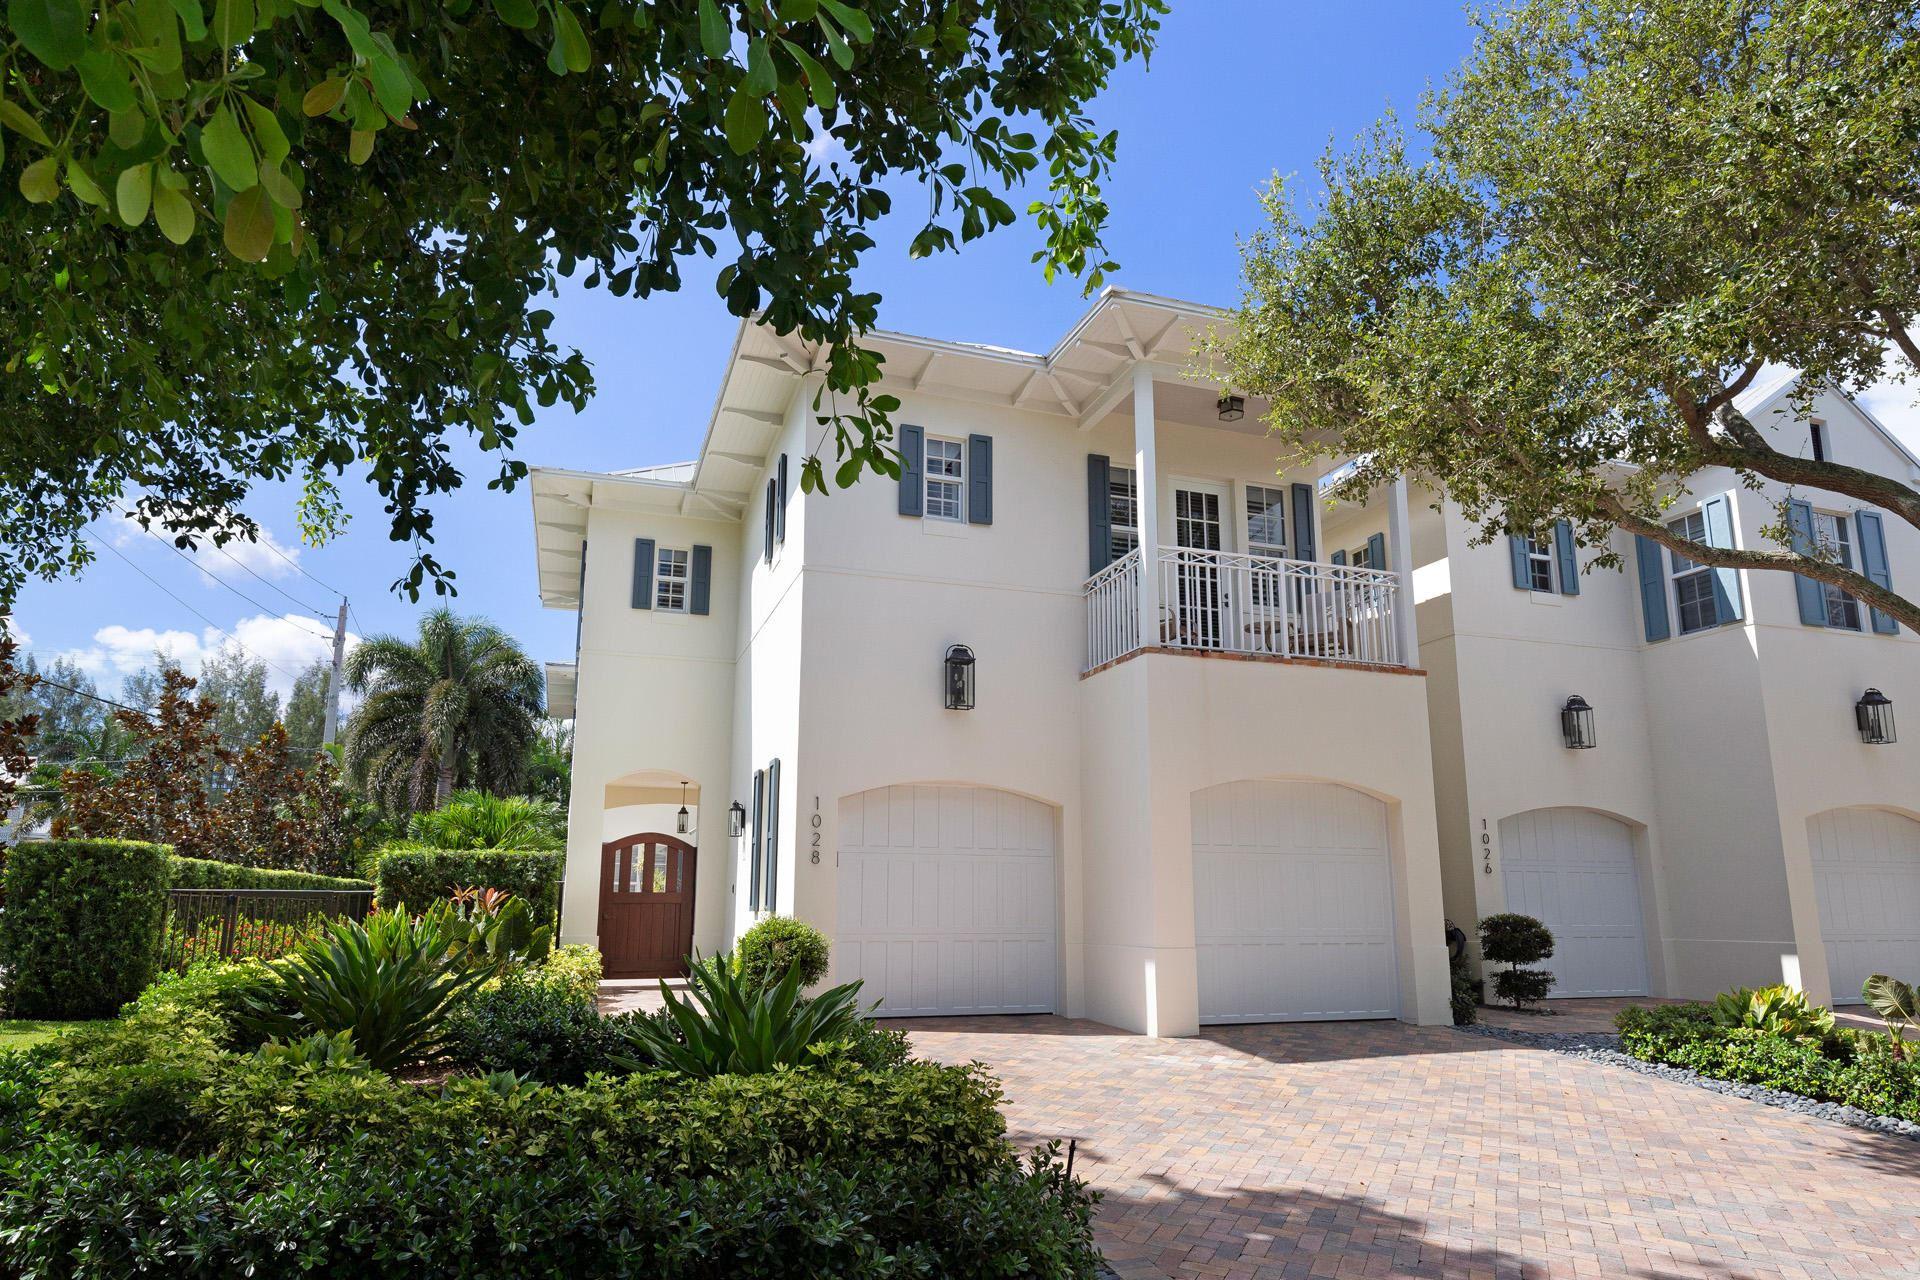 1028 Bay Street, Delray Beach, FL 33483 - #: RX-10557589